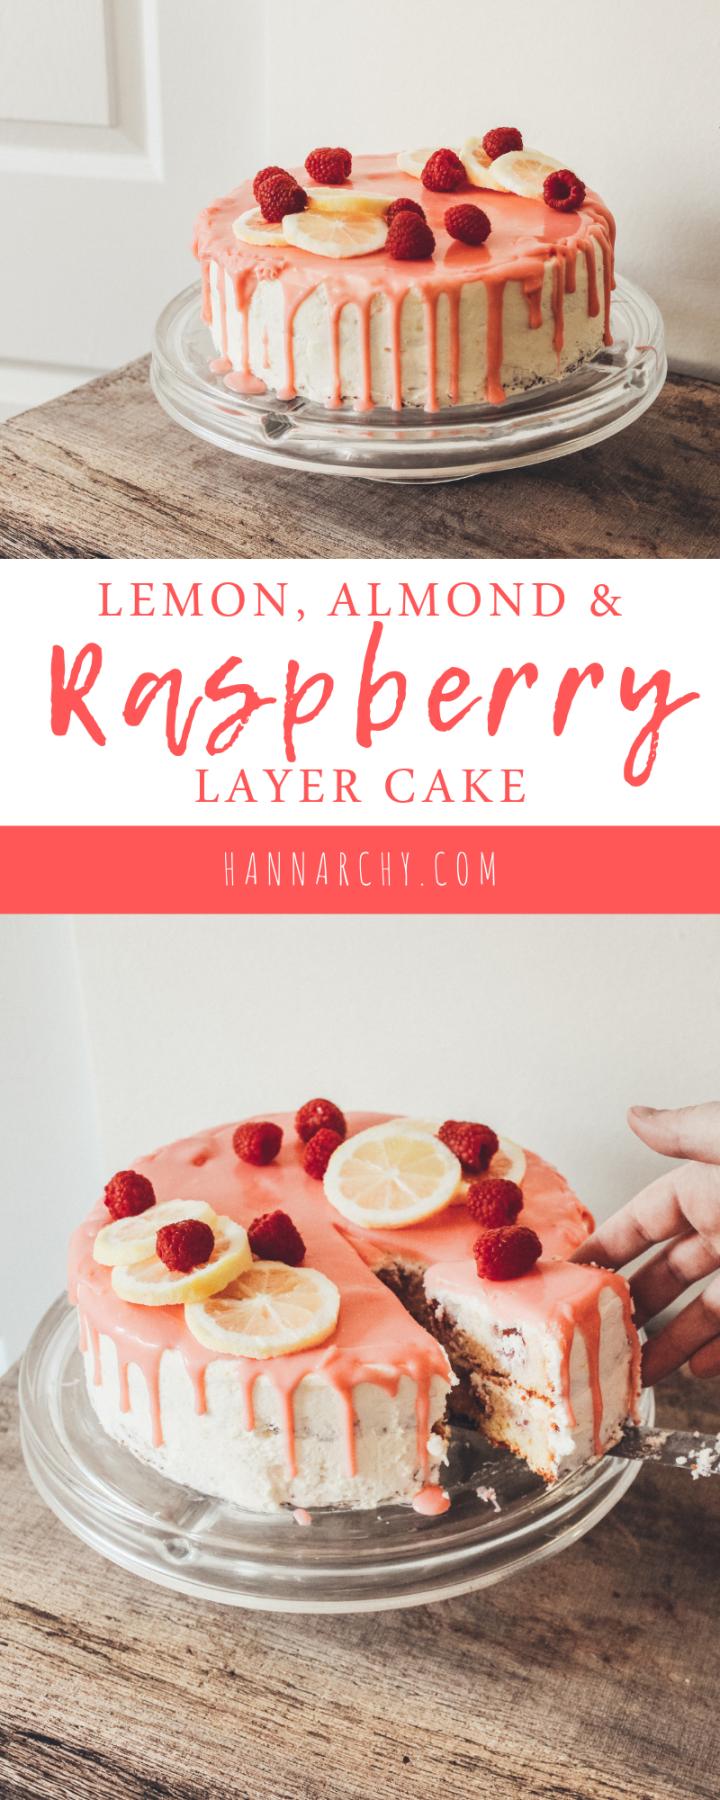 Strange Lemon Almond And Raspberry Layer Cake Chocolate Raspberry Cake Personalised Birthday Cards Arneslily Jamesorg